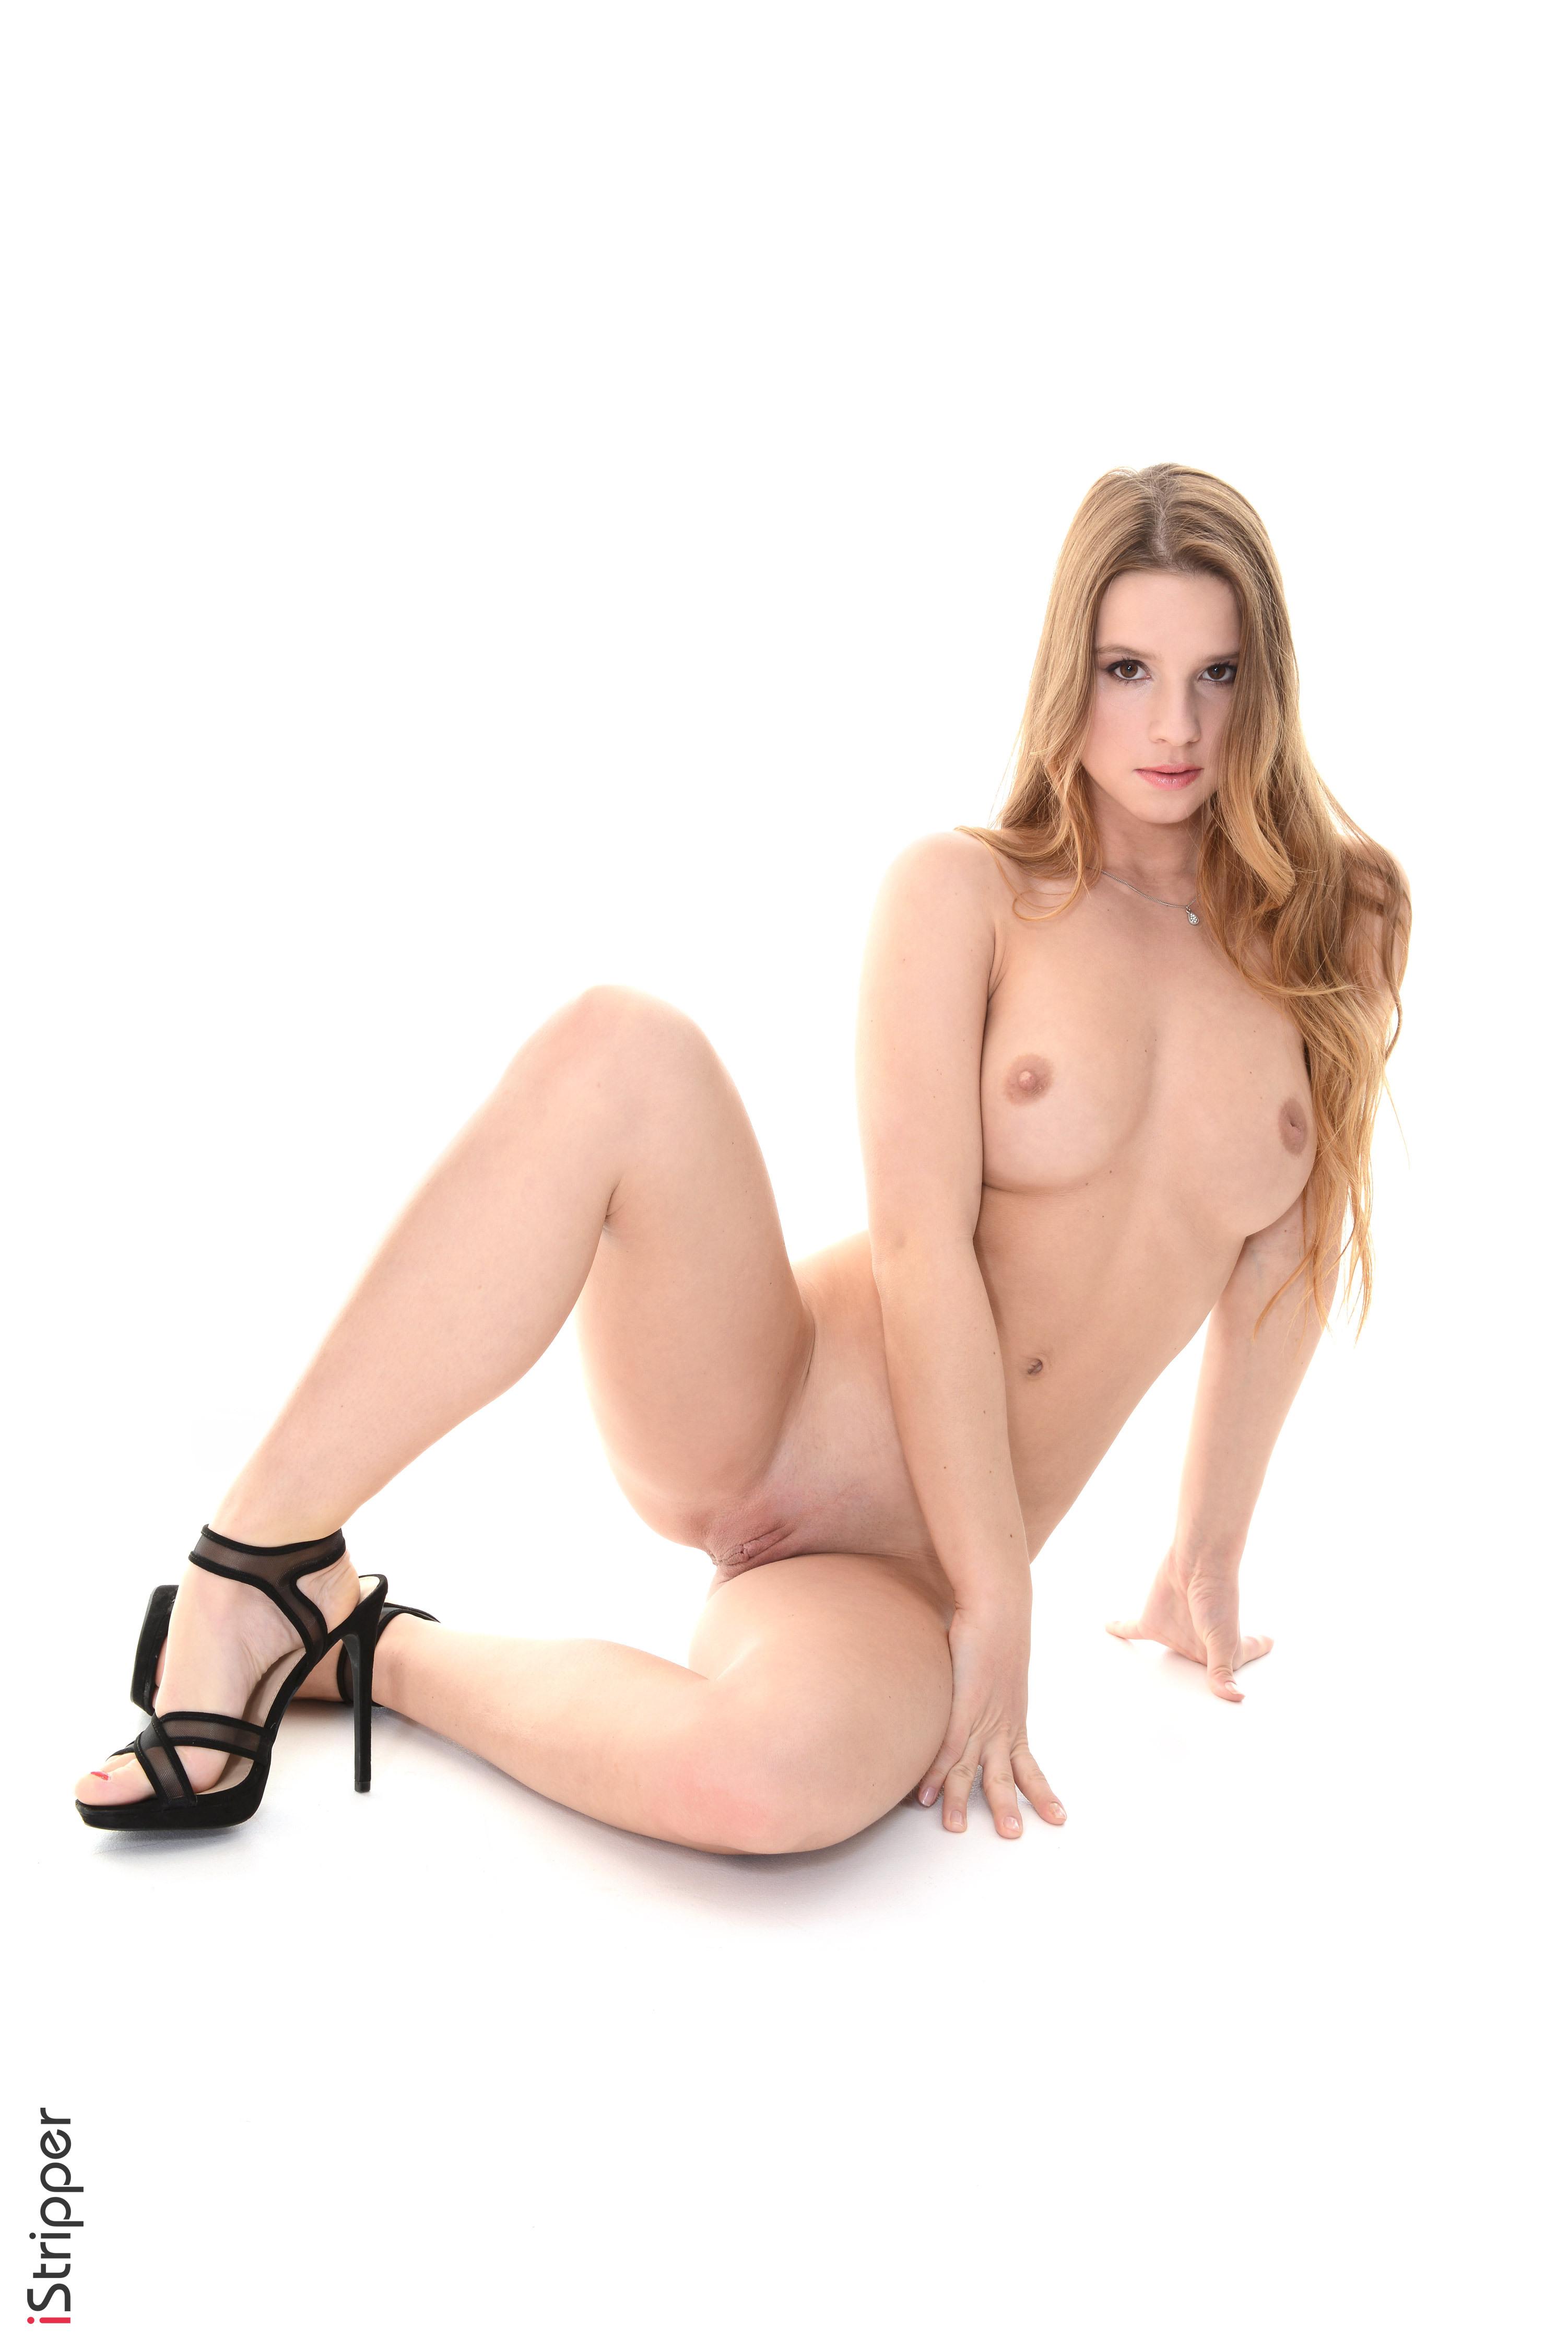 nude girls stripping gif